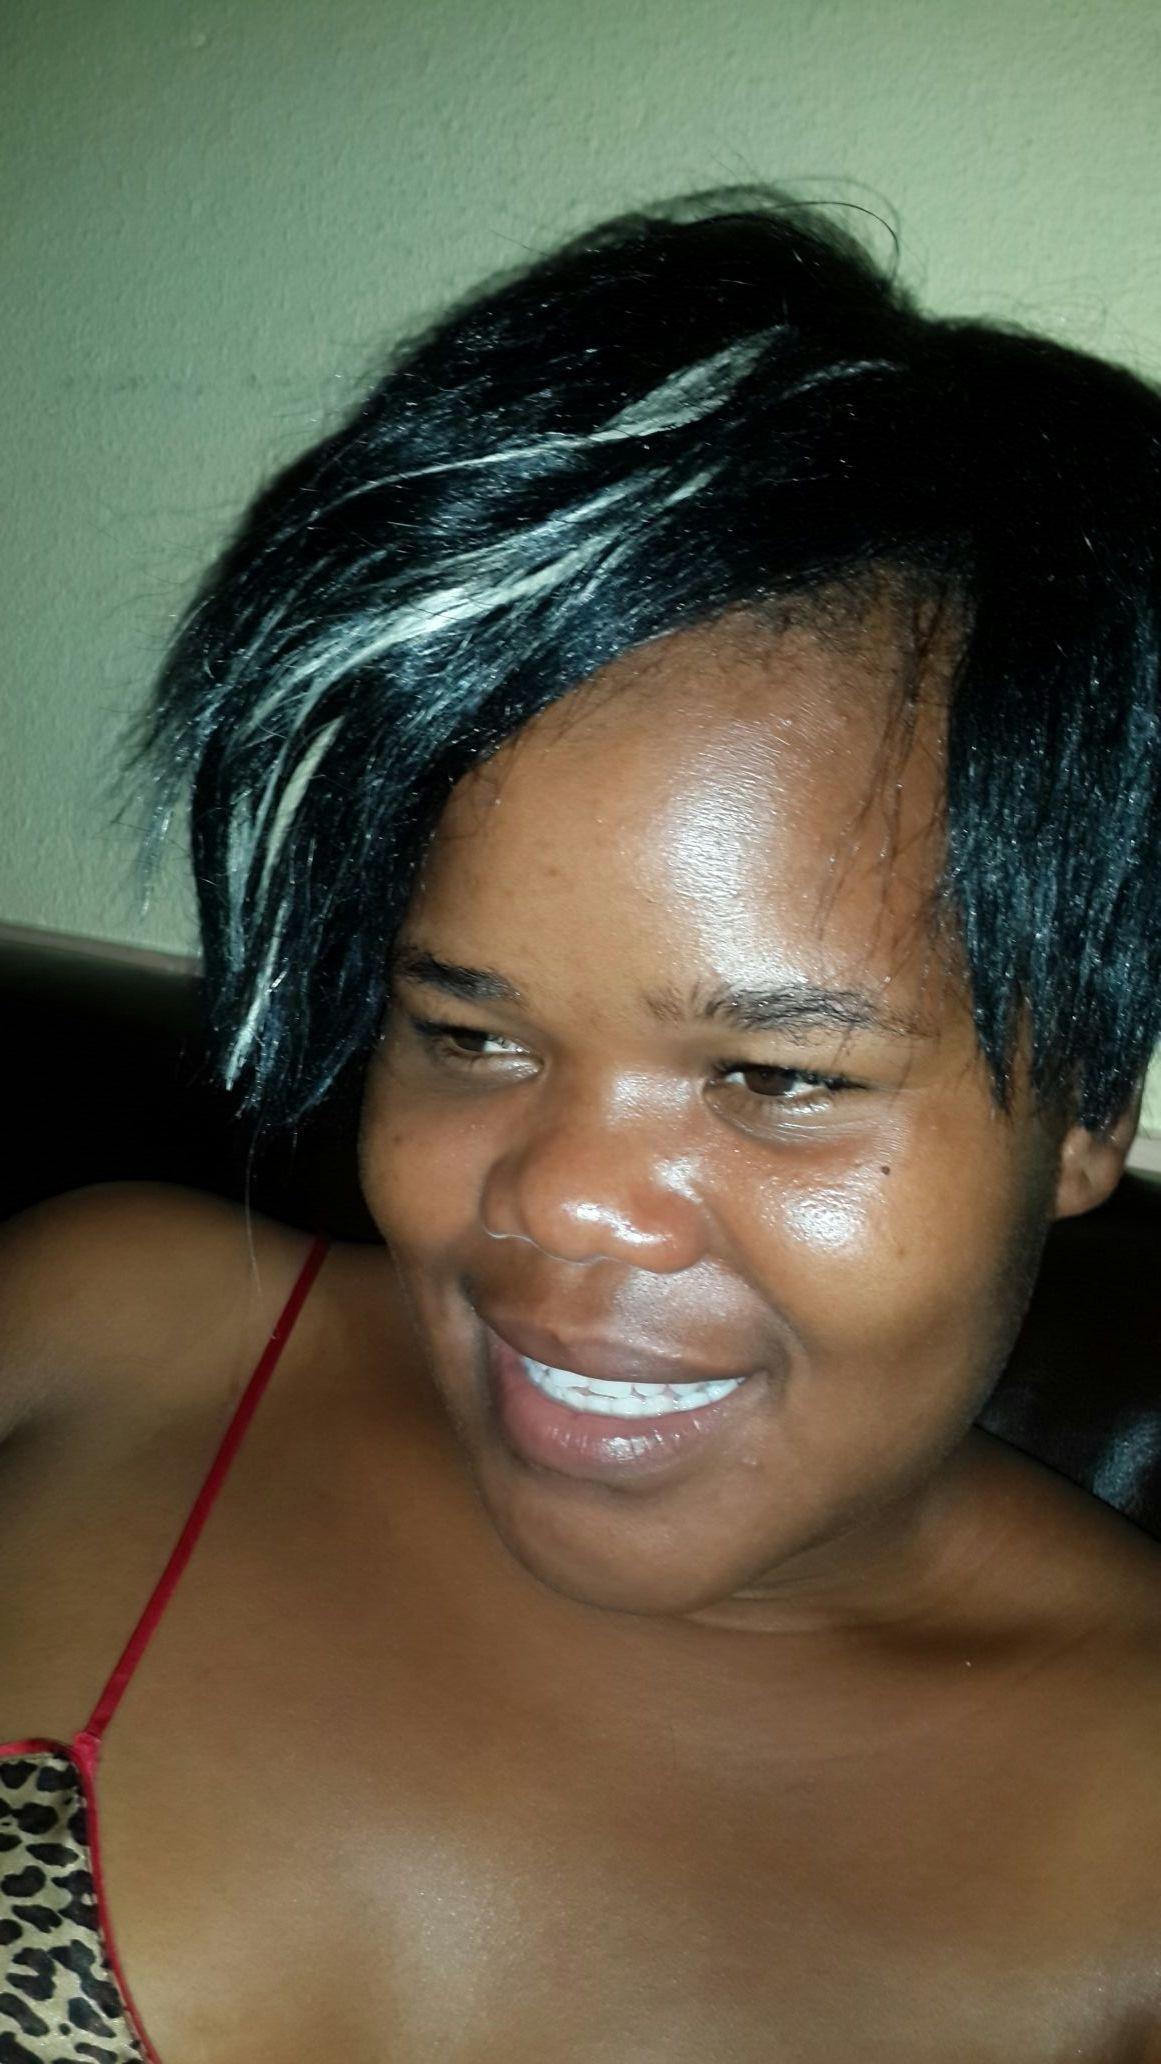 Ehhhhhhhh...I wonder y her hair is like dis...tjo